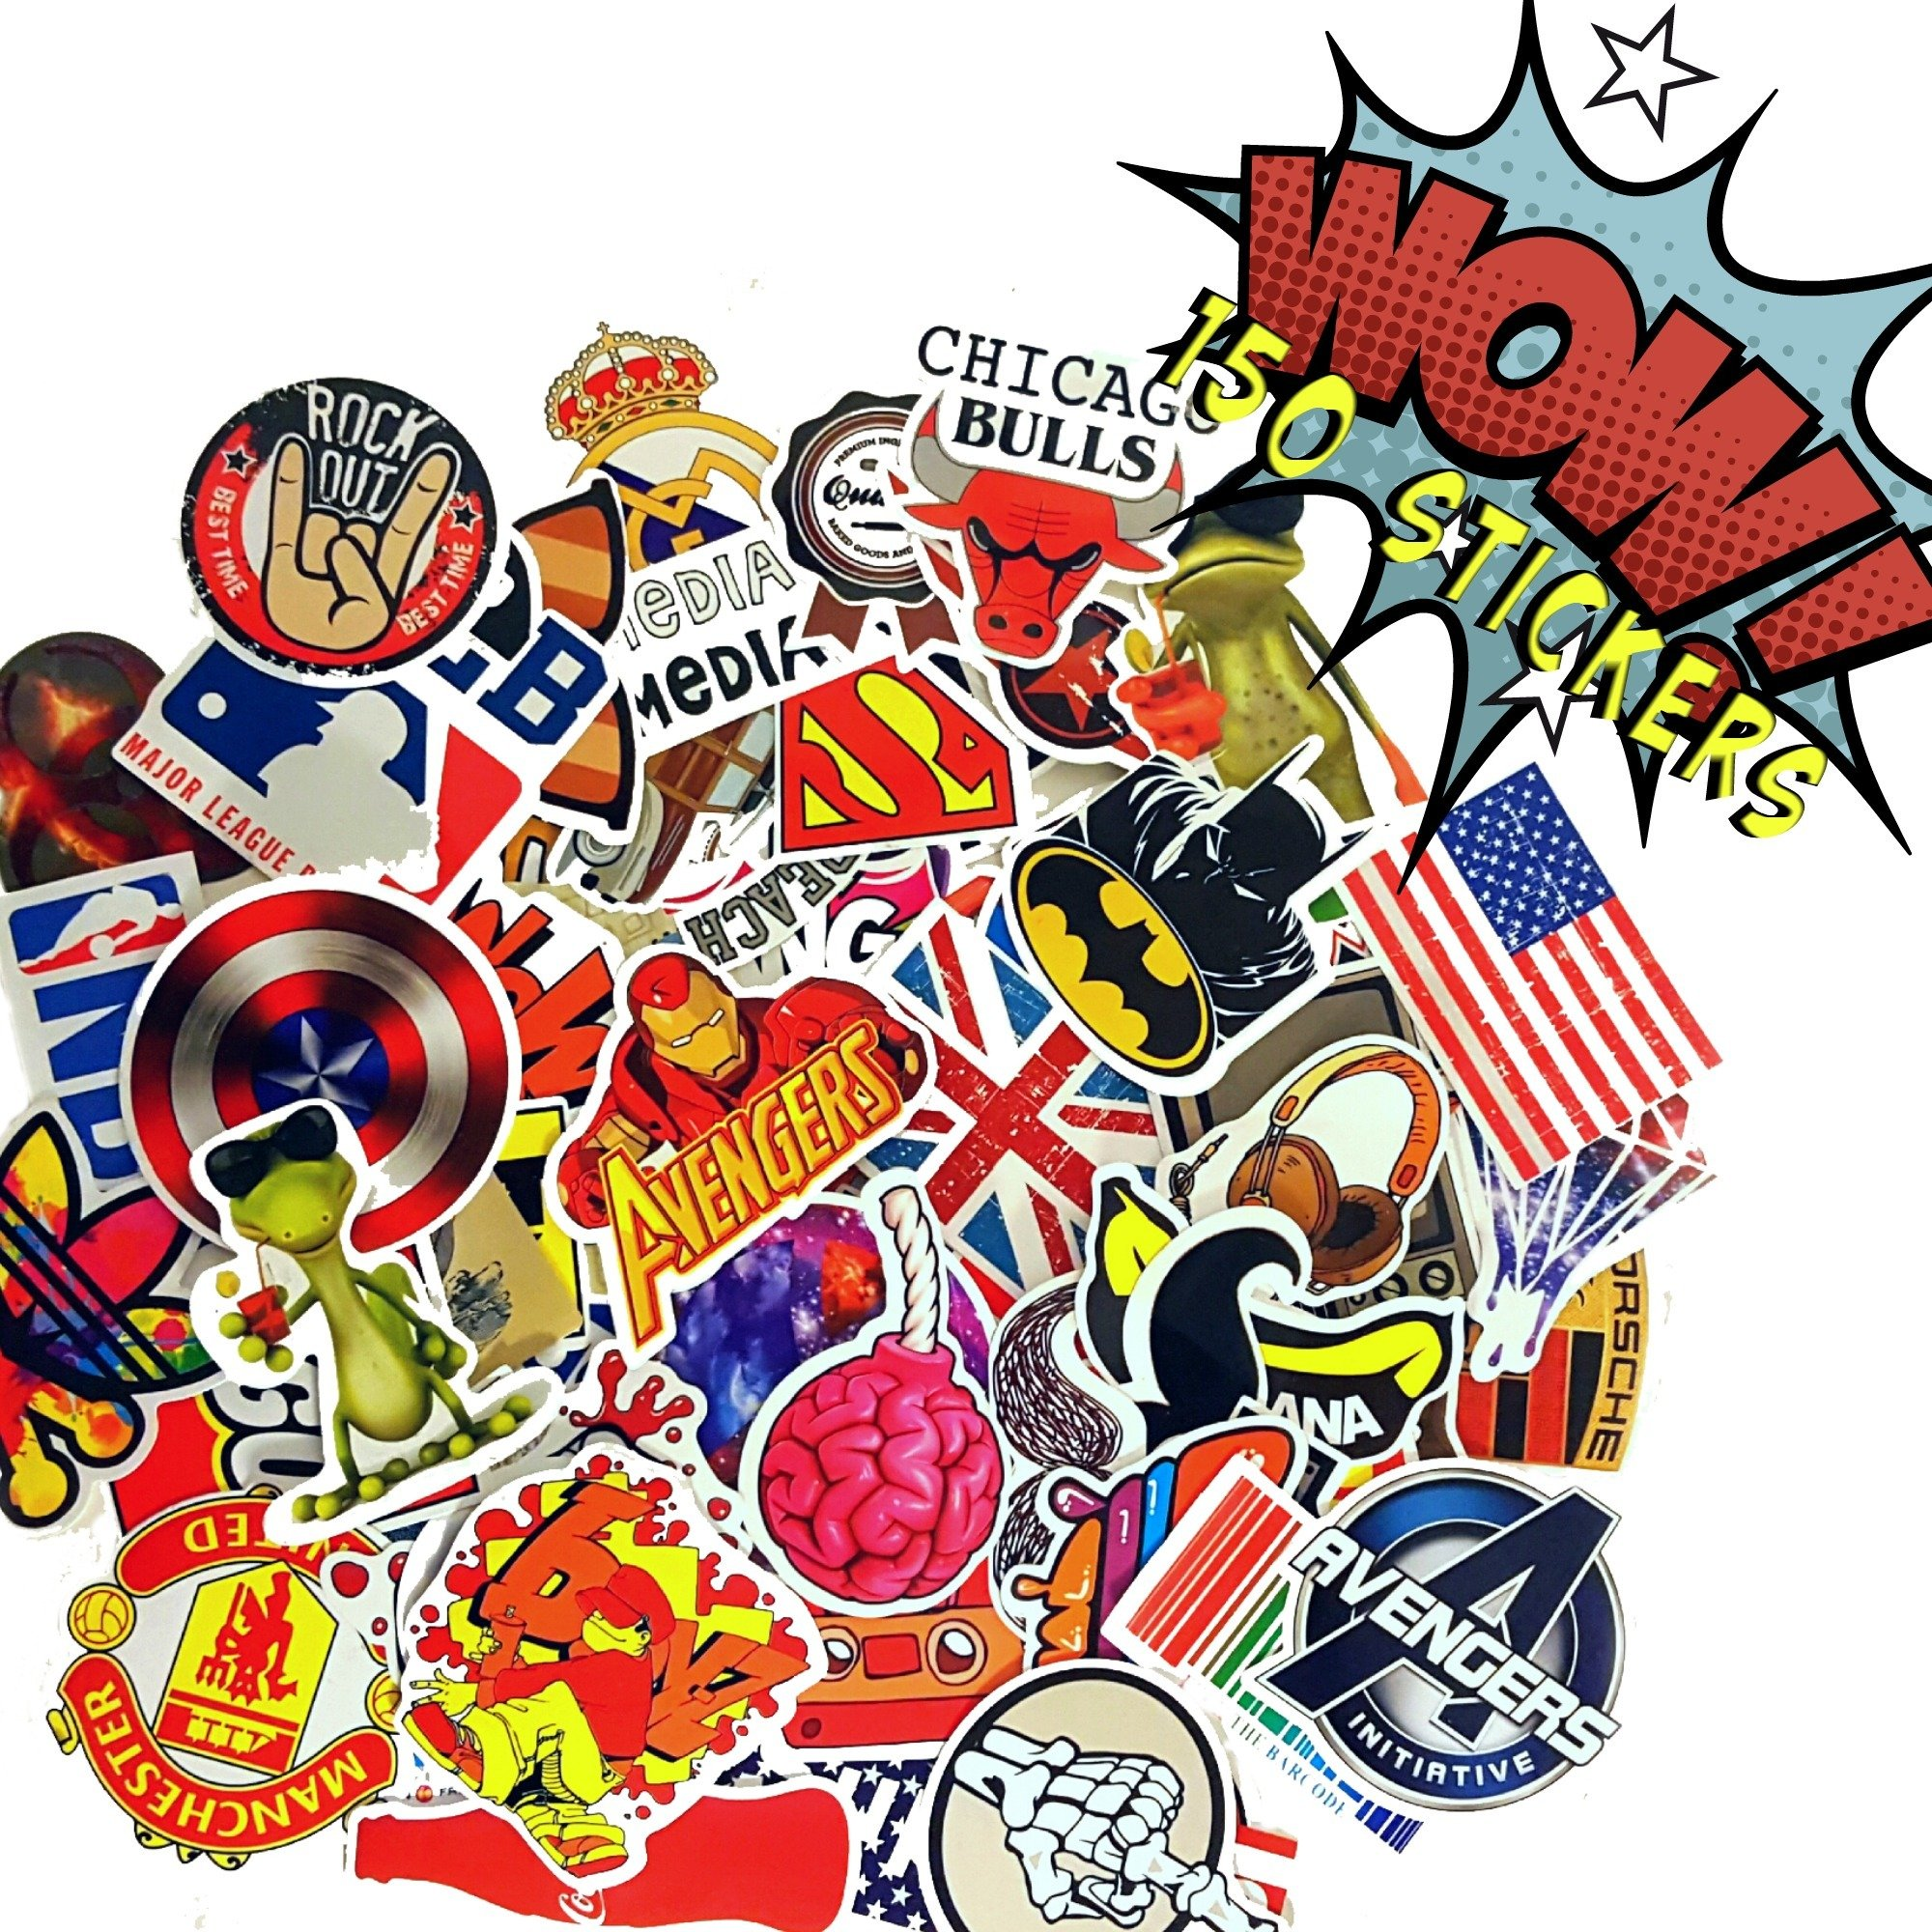 Premium Pack & Only Bag of 100+50 Bonus Pokemon & Vinyl Graffiti Decal Logo Stickers-Personalize laptops, Skateboard, Snowboard, Car,Helmet,Luggage,Bikes.Great Halloween stickers treat!!